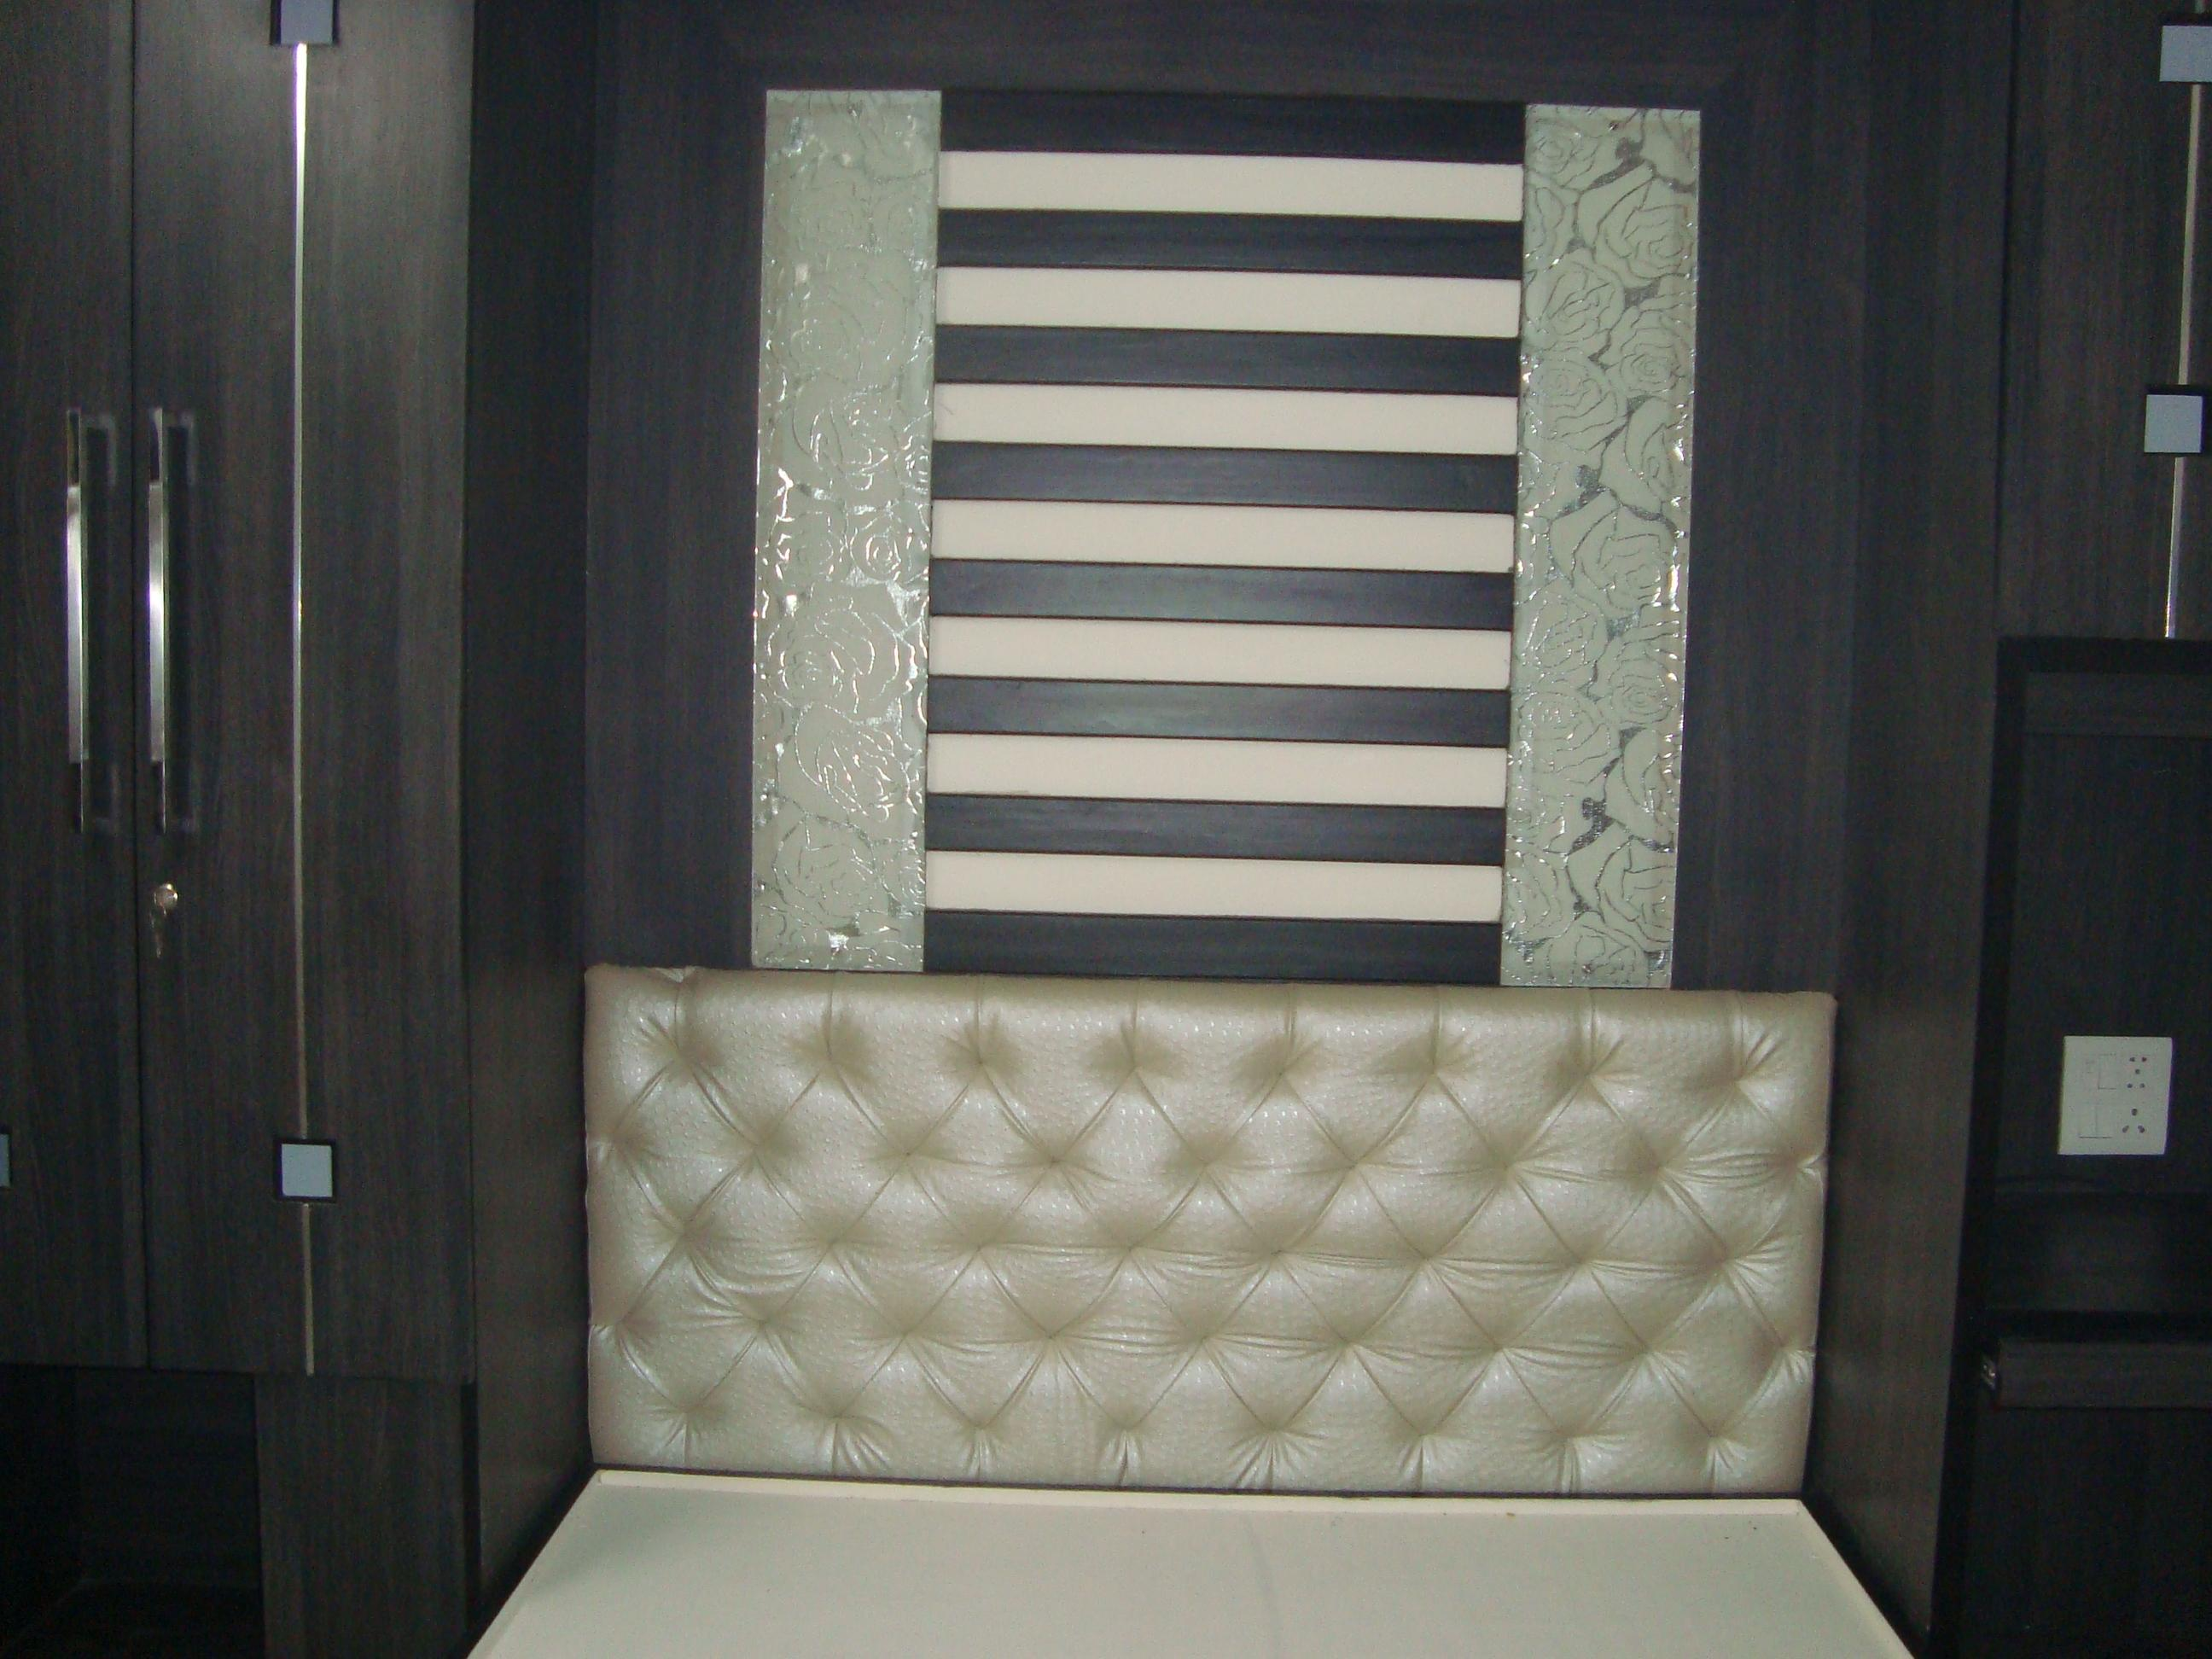 Bed Headboard Design